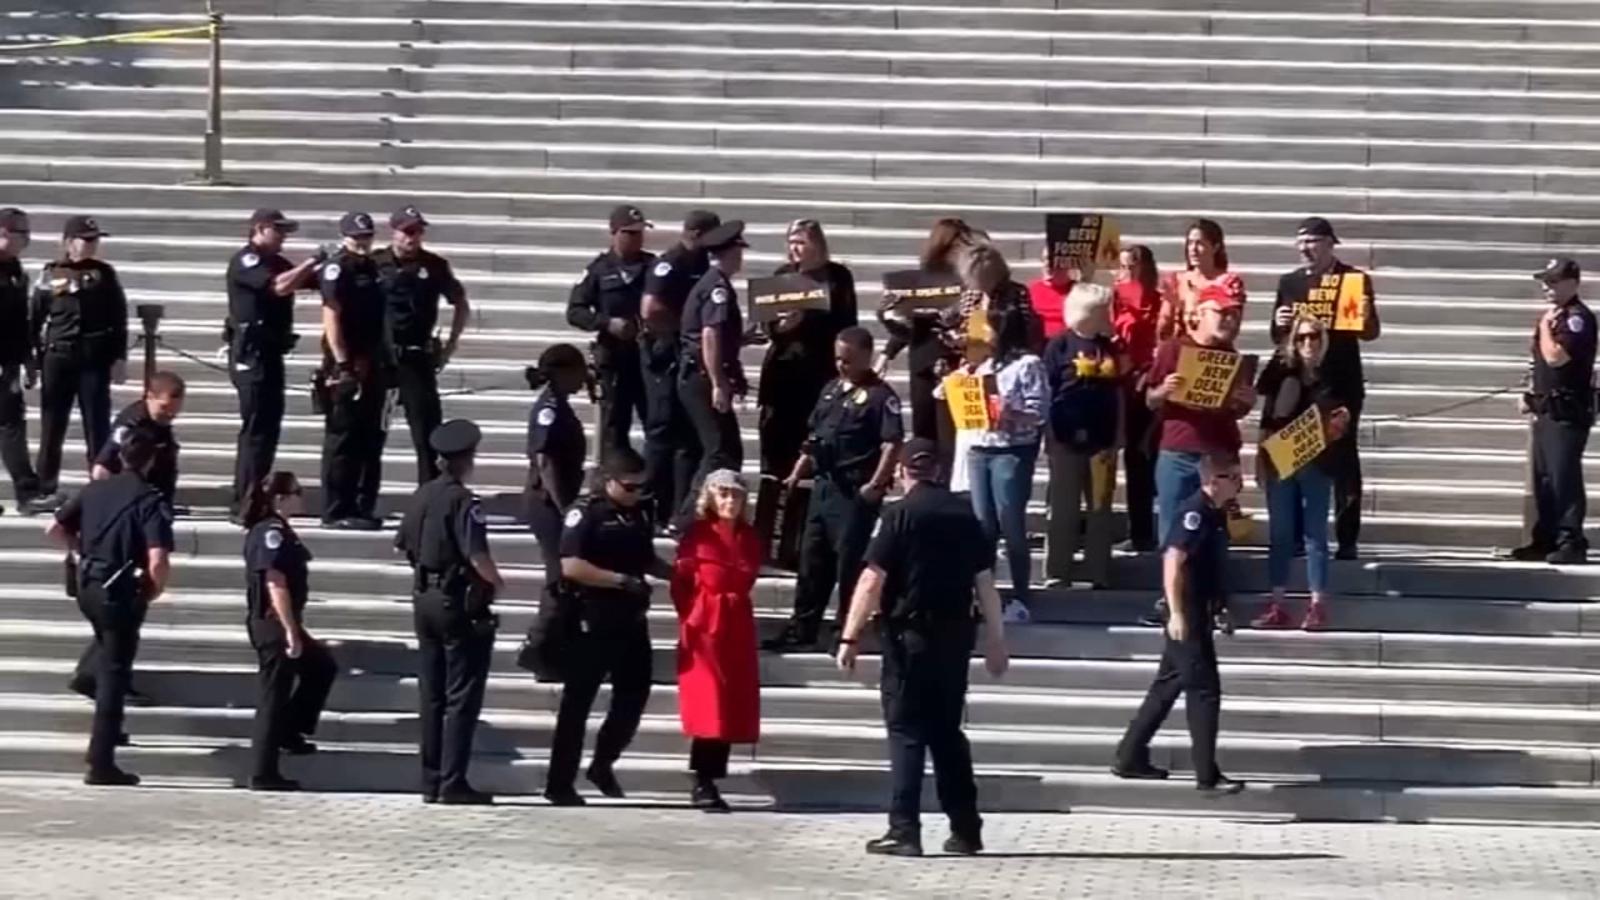 Jane Fonda arrested at climate change protest outside US Capitol - WLS-TV